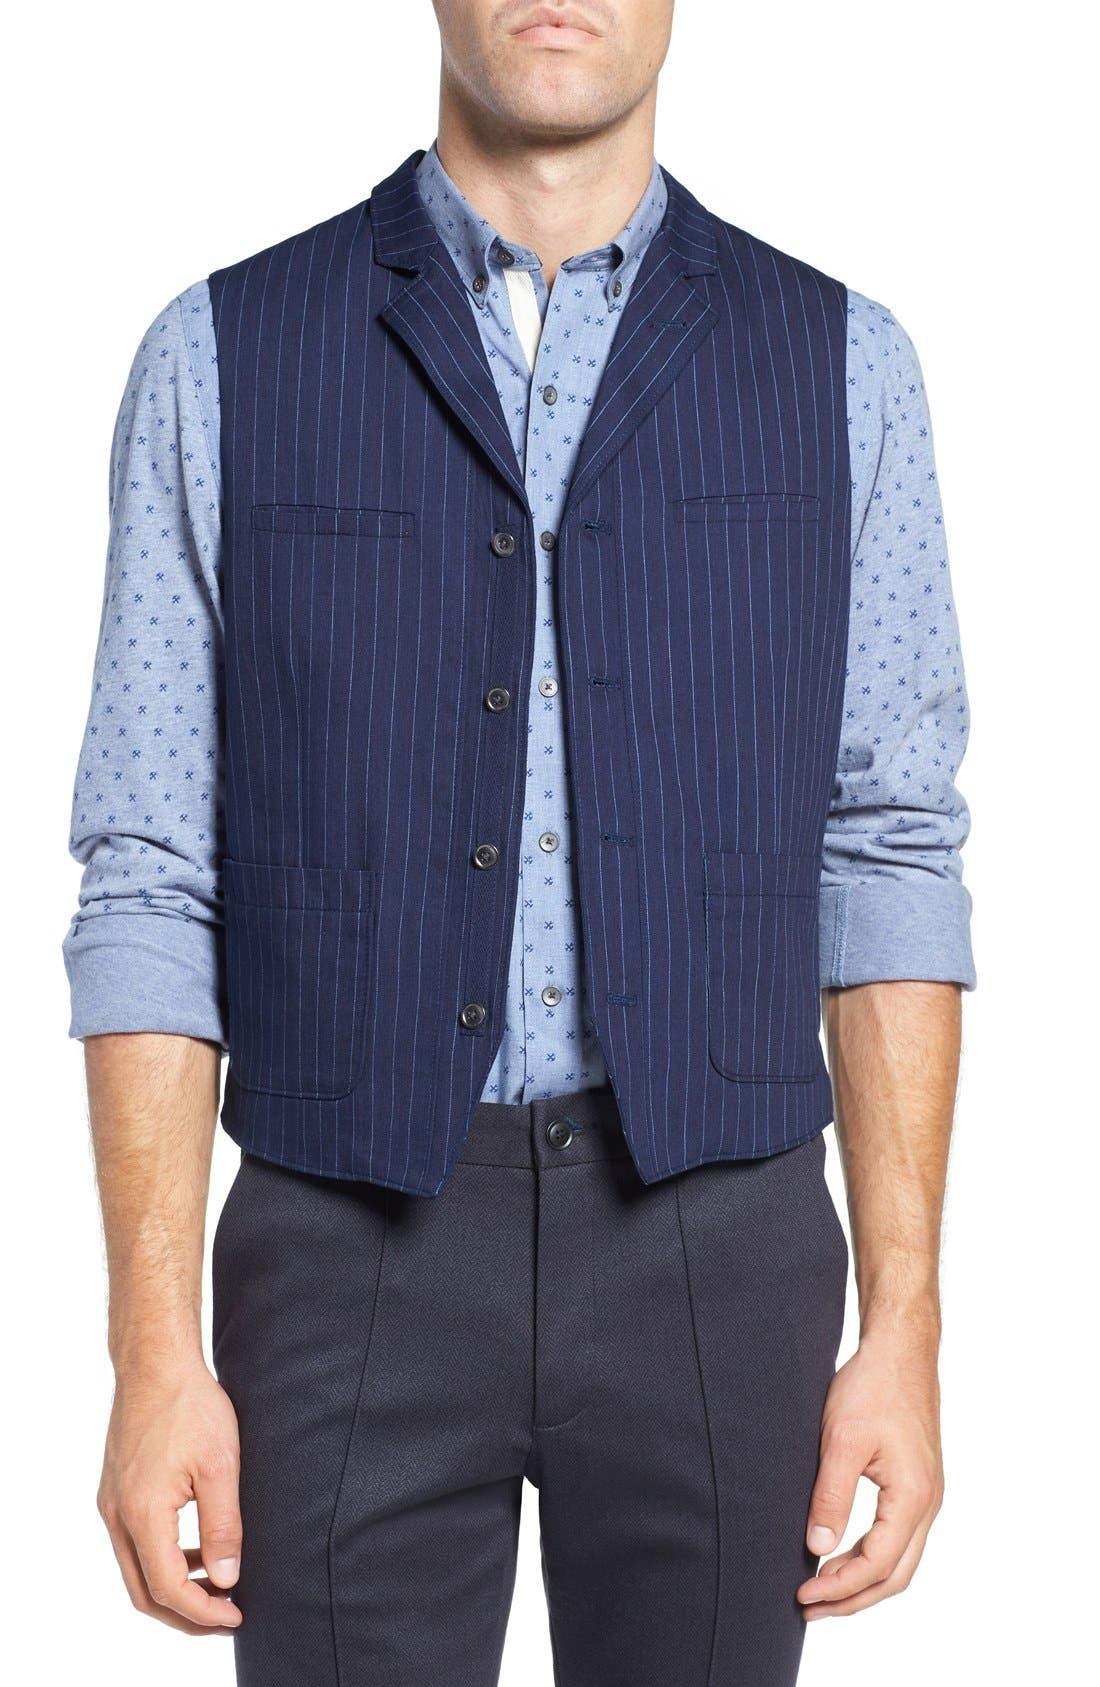 Windsor Pinstripe Cotton Twill Vest,                         Main,                         color, 410